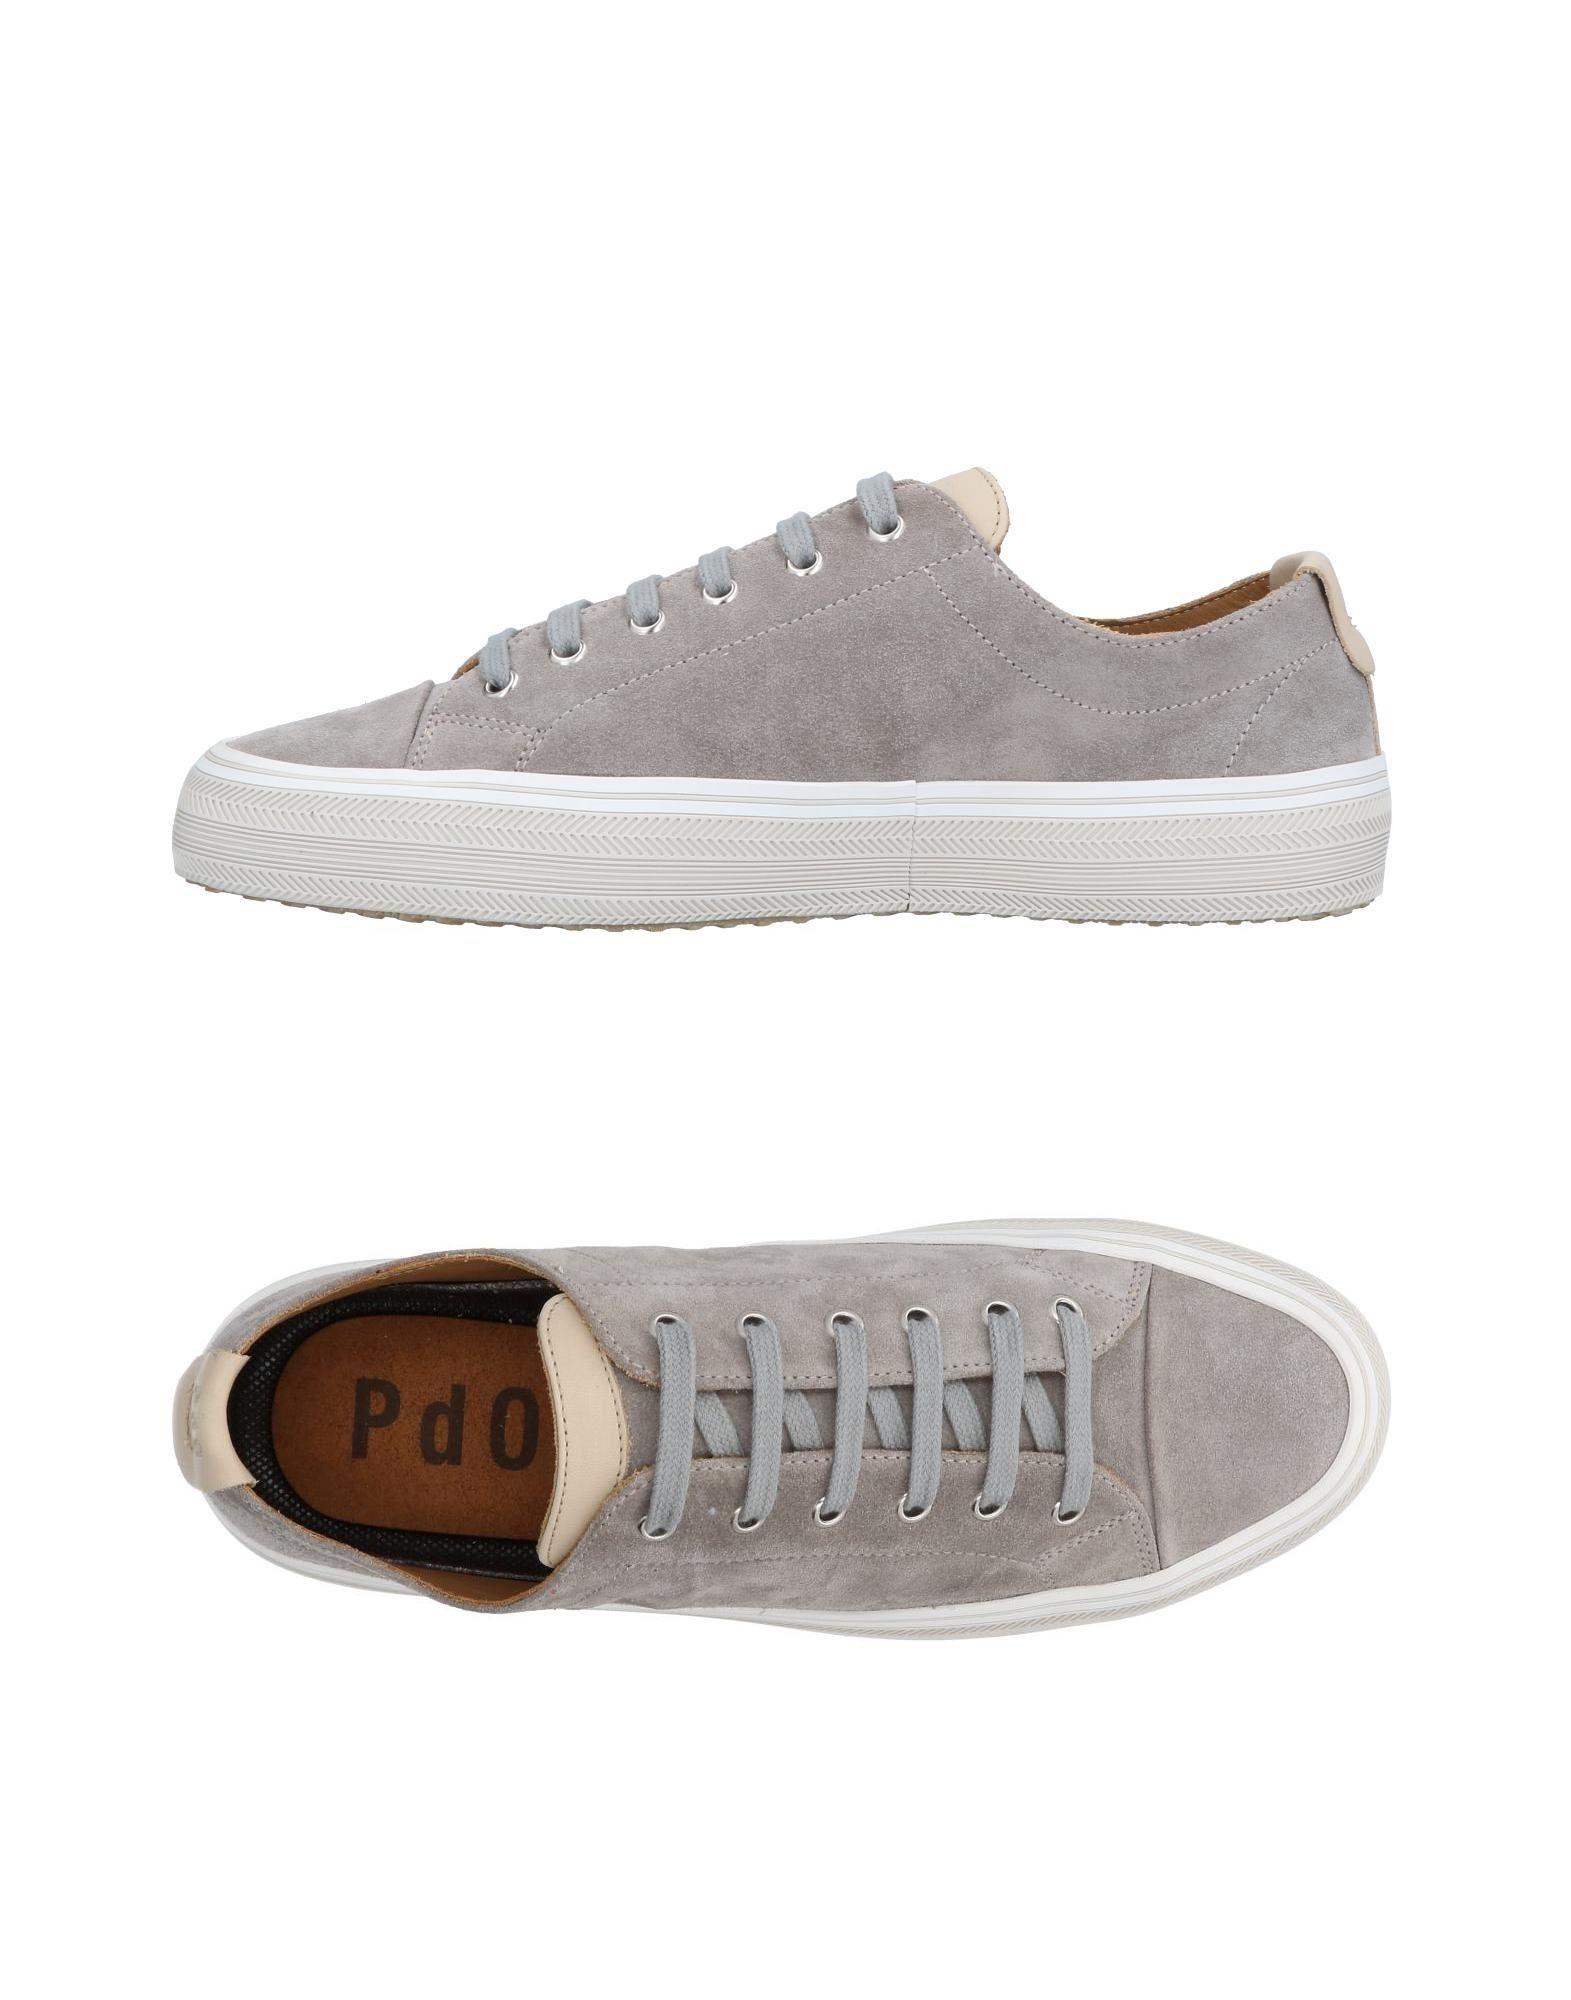 Rabatt echte Schuhe Pantofola D'oro Sneakers Herren  11493178OI